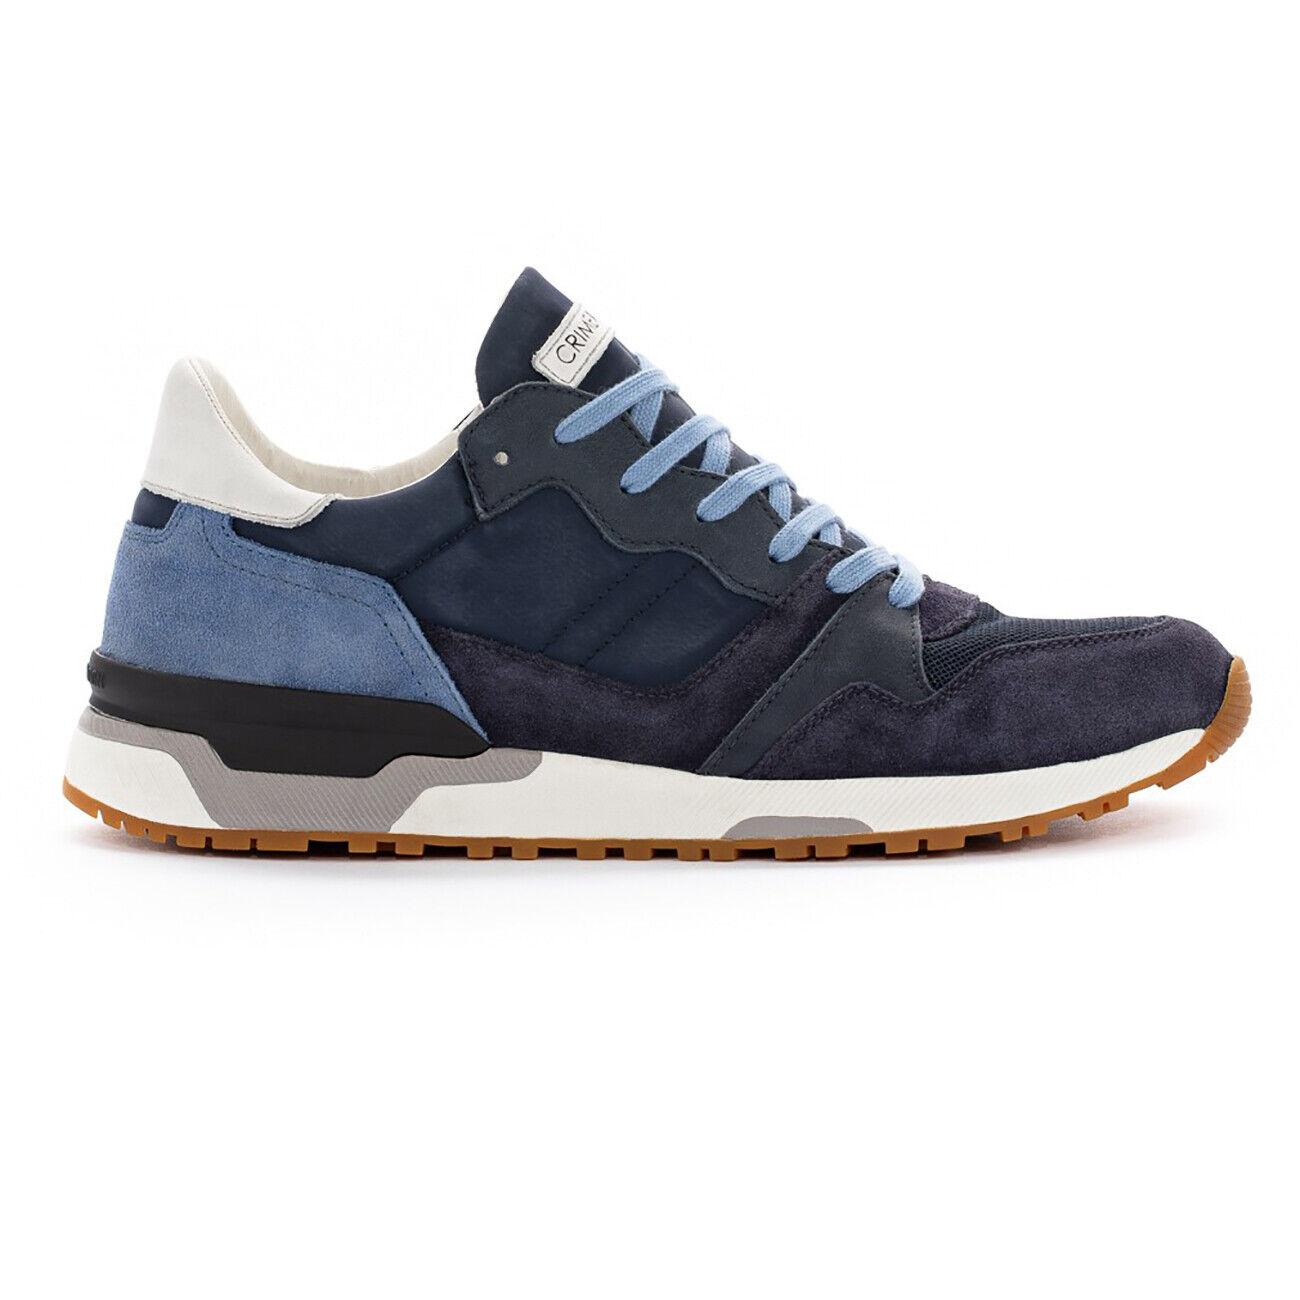 Chaussures hommes bleu Turnchaussures CRIME LONDON in pelle e tessuto art ESCAPE 11402PP1.40